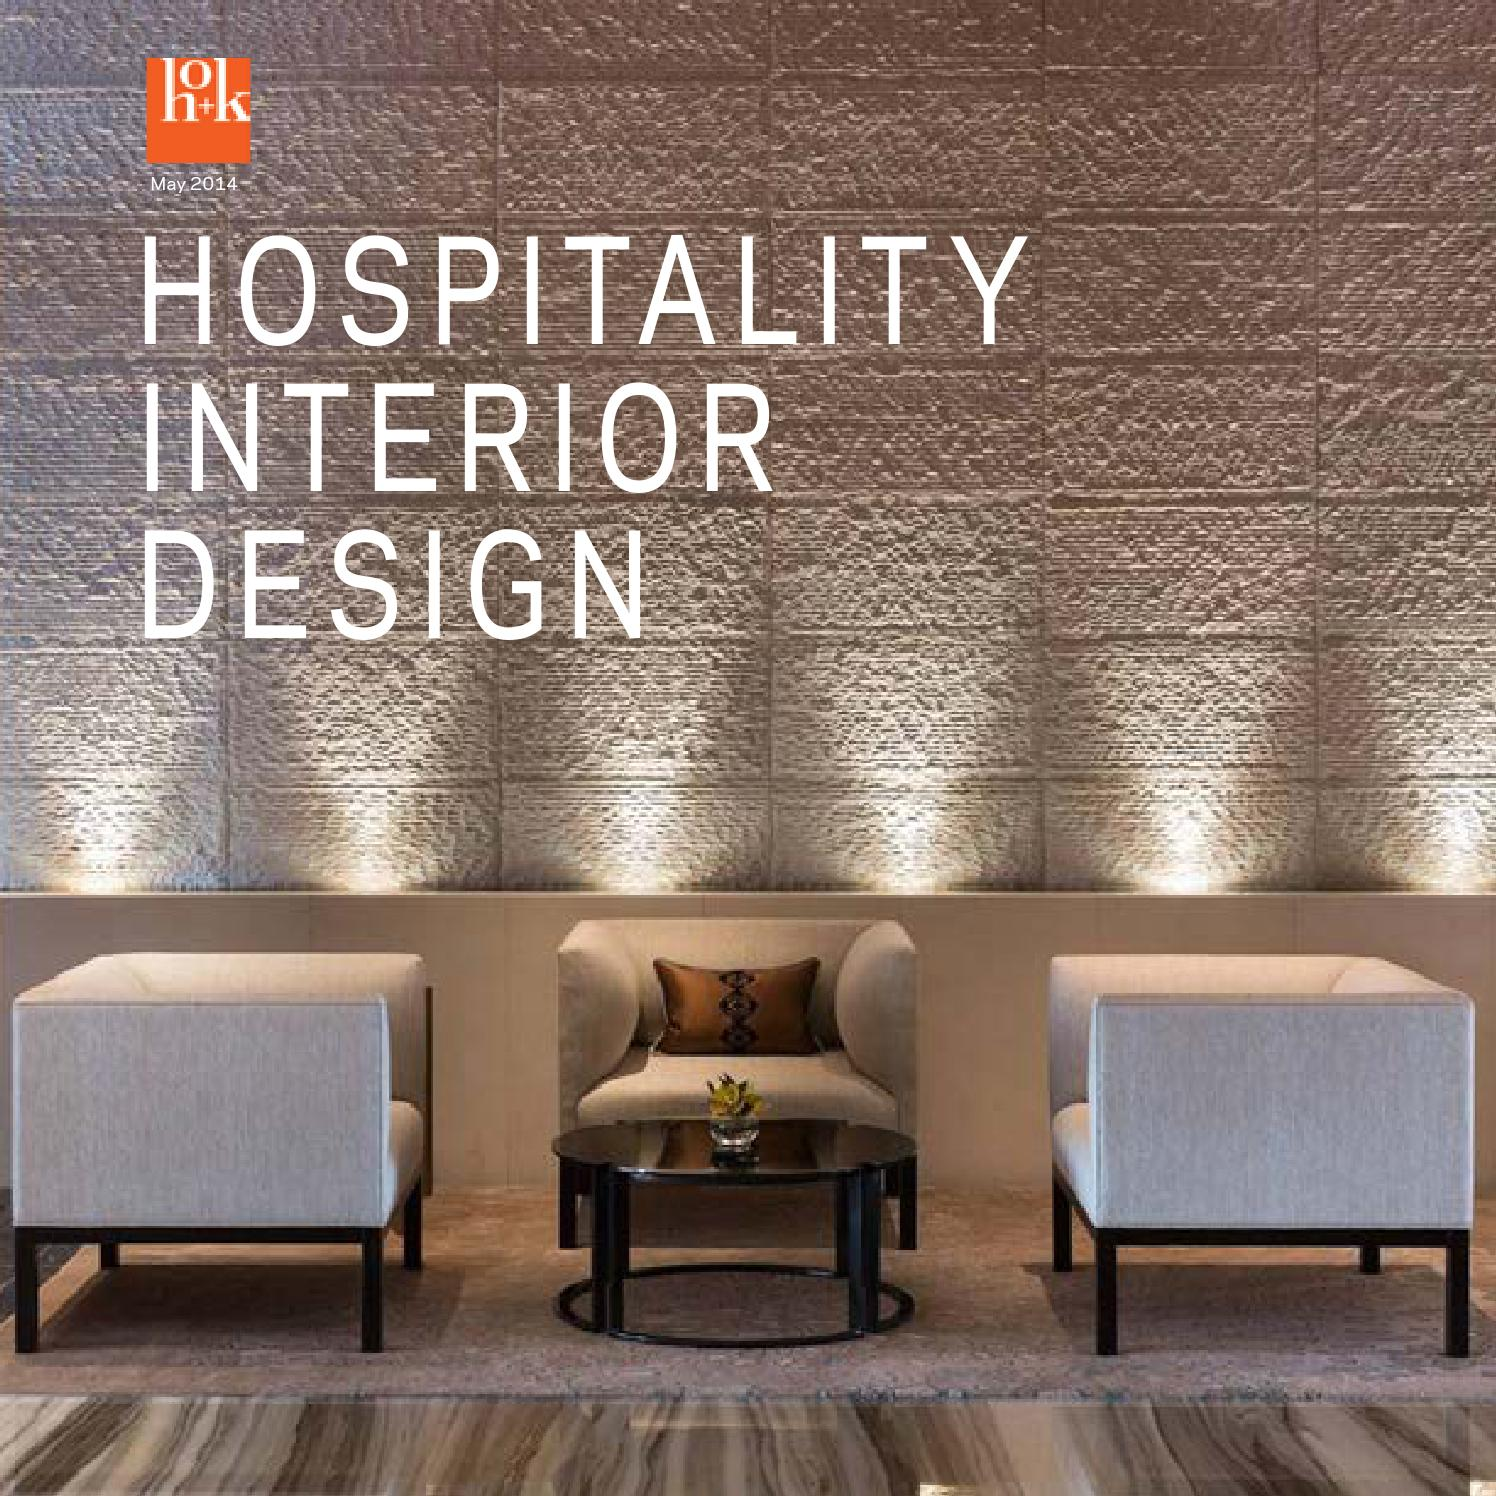 Issuu hok hospitality interior design by hok marketing for Hospitality interior design